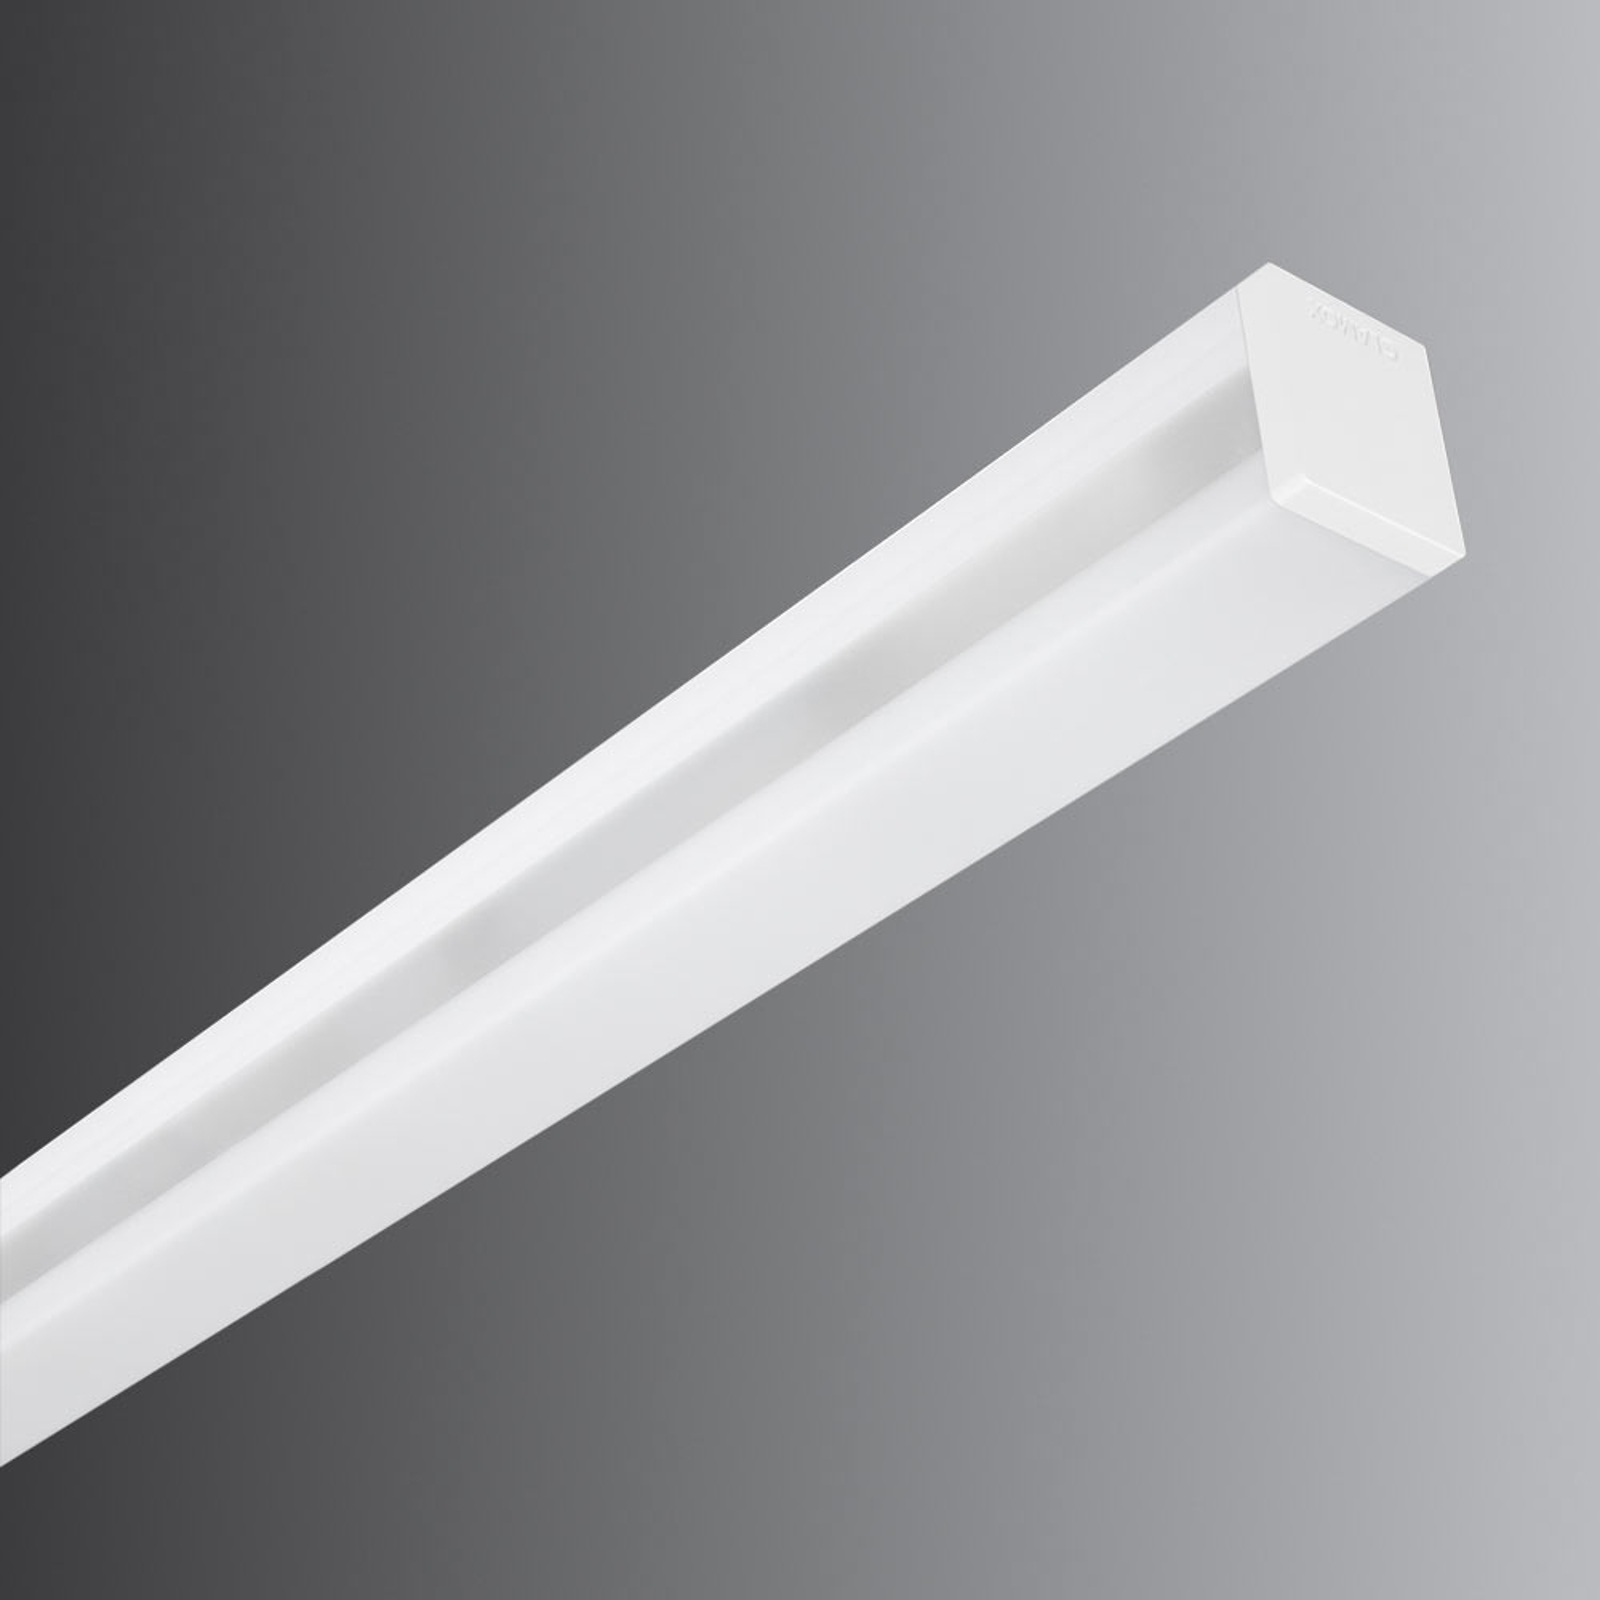 16 W LED-peililamppu A40-W1200 2100HF 120cm 4 000